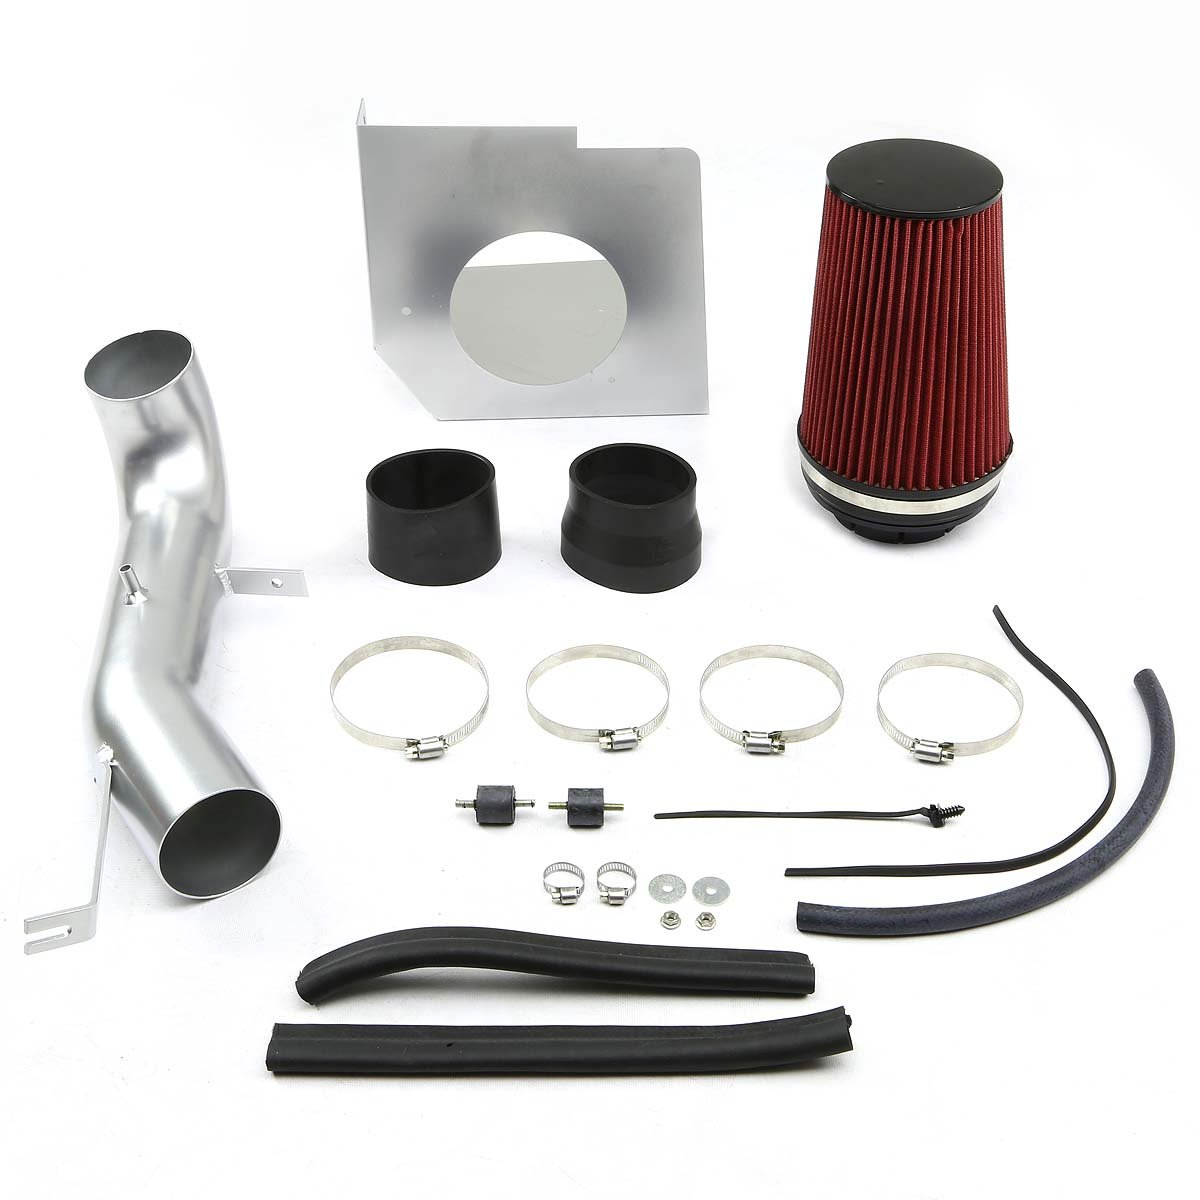 DNA MOTORING Silver CAIP-3-HS-YUKON07-SLSL Cold Air Intake Pipe+Heat Shield System for 07-08 Escalade ESV EXT//Silverado//Sierra